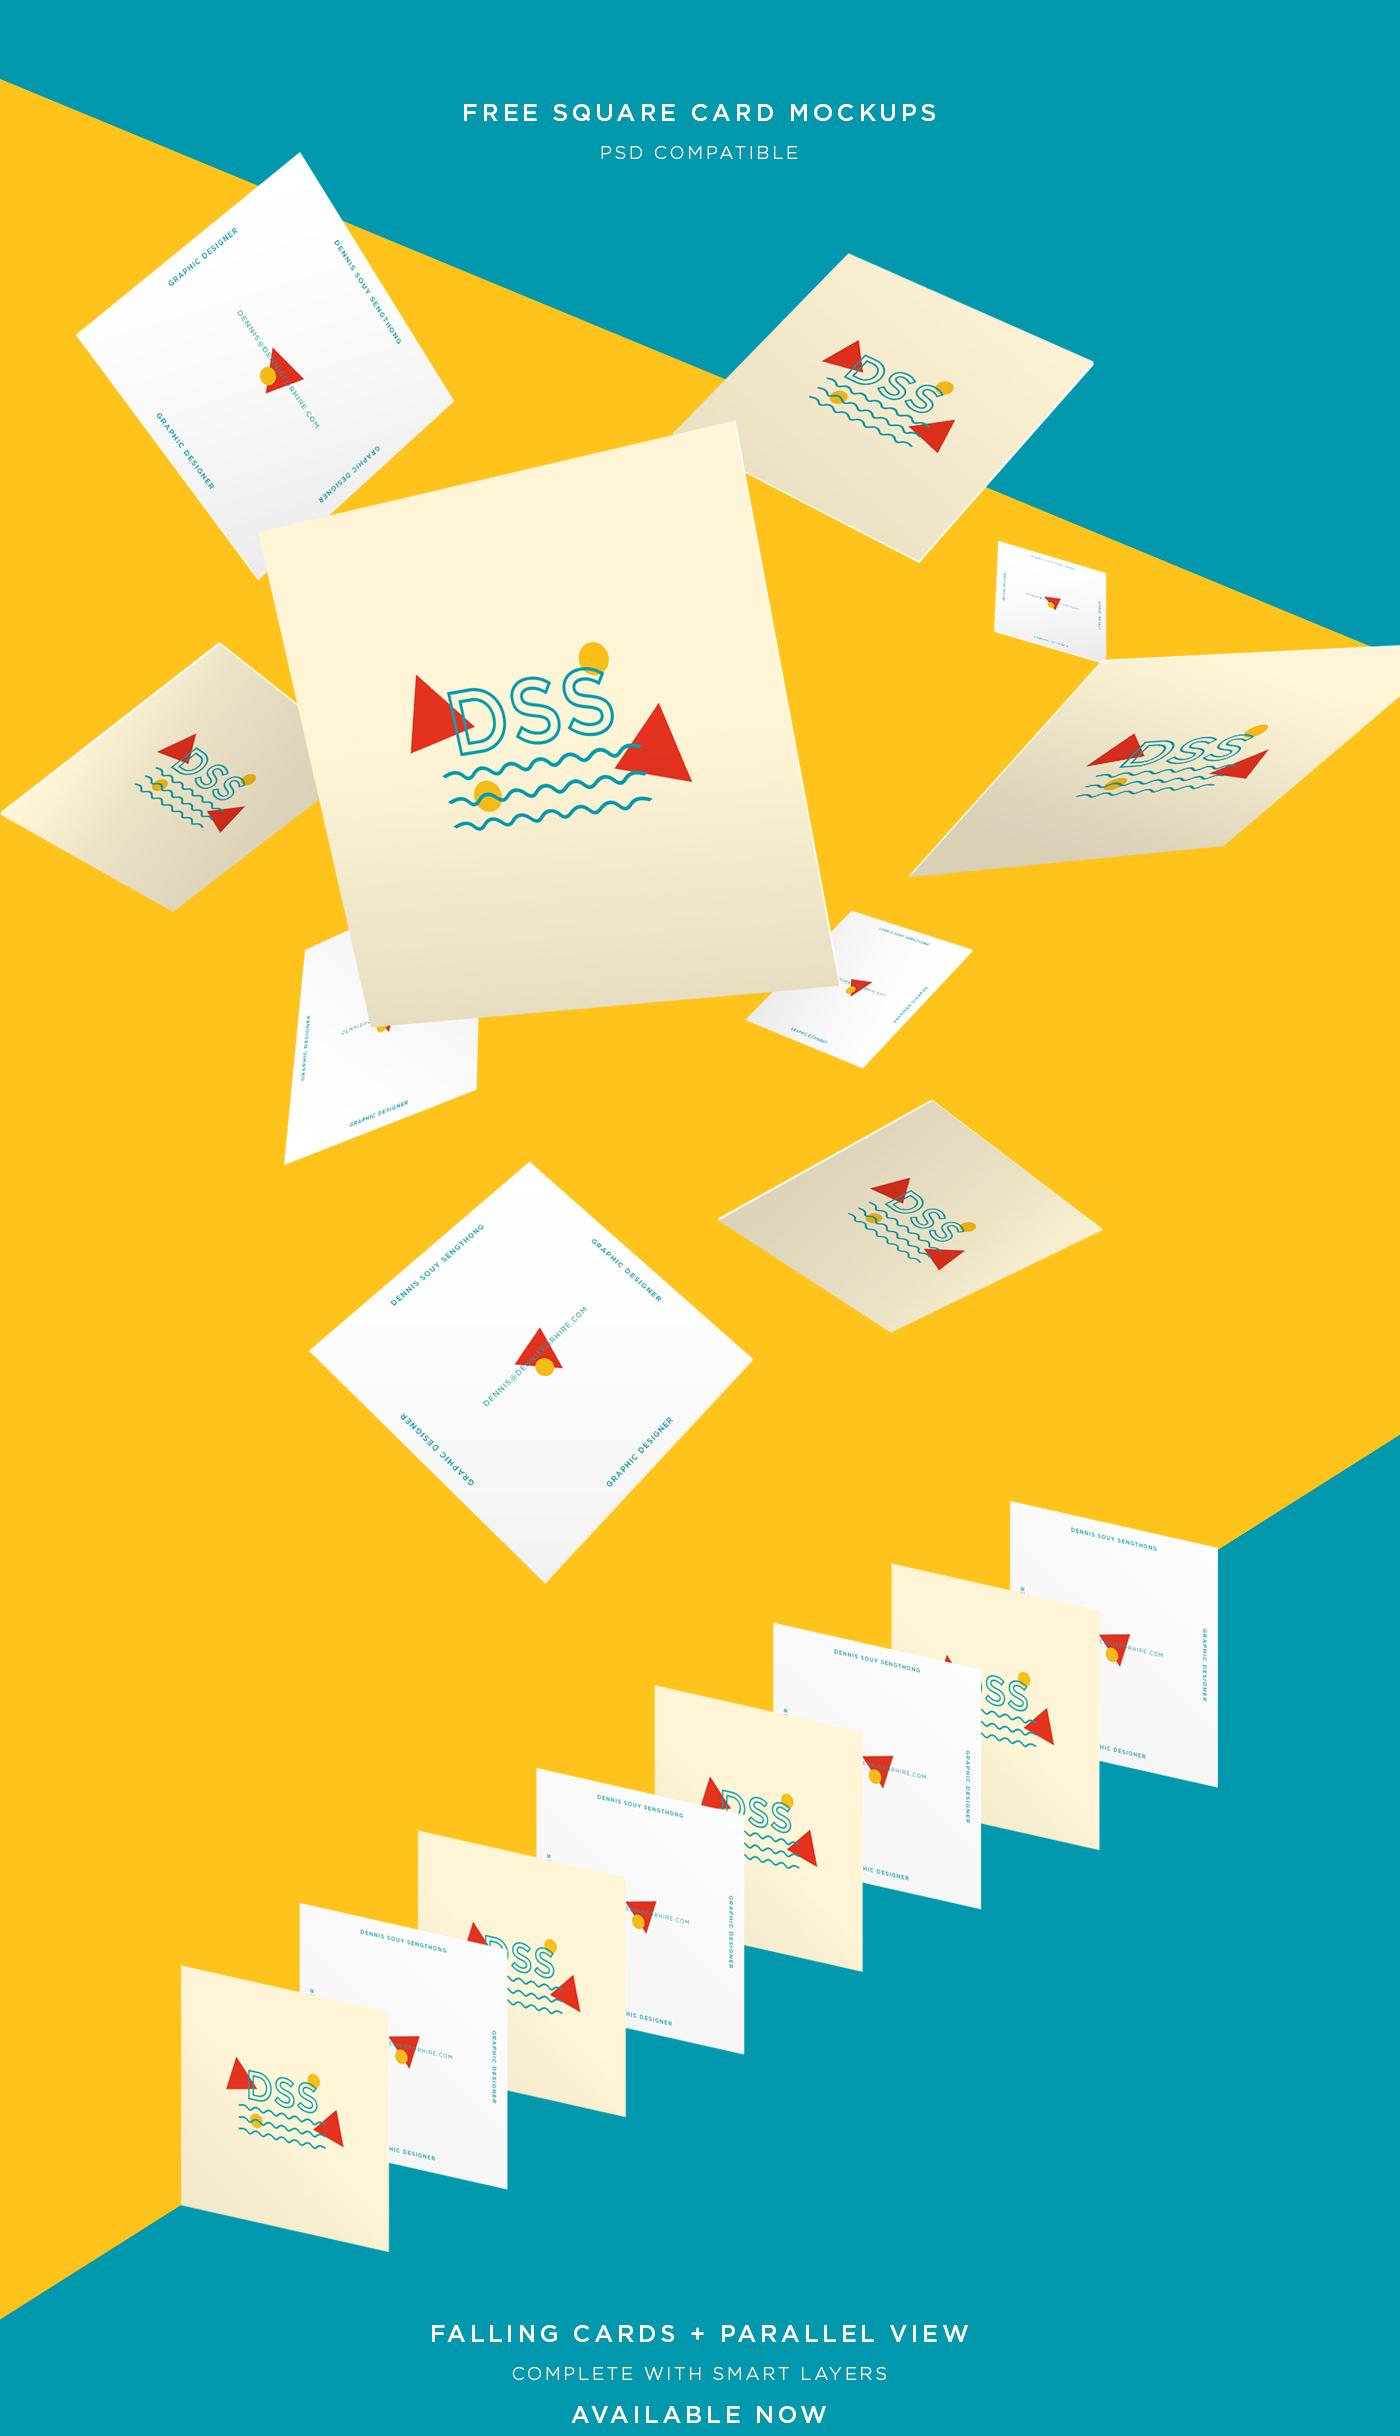 Free Square Card Mockups on Behance